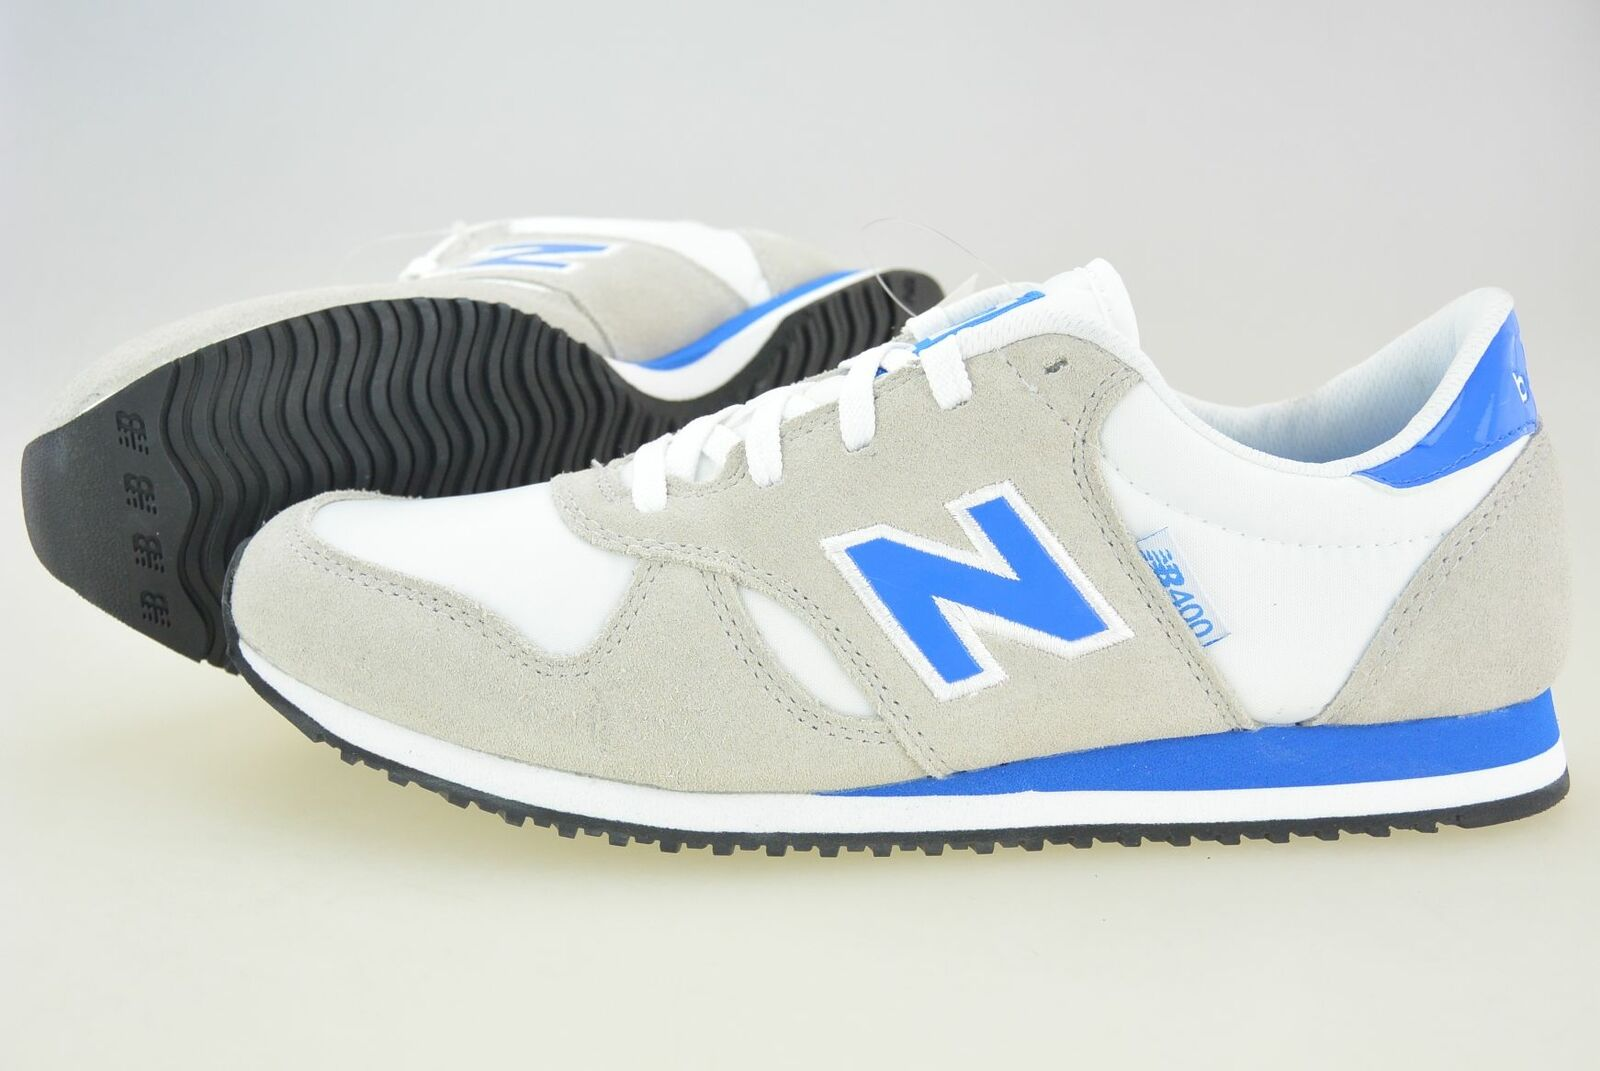 NEW Balance M 400 SWB Men shoes Men Sneaker White bluee